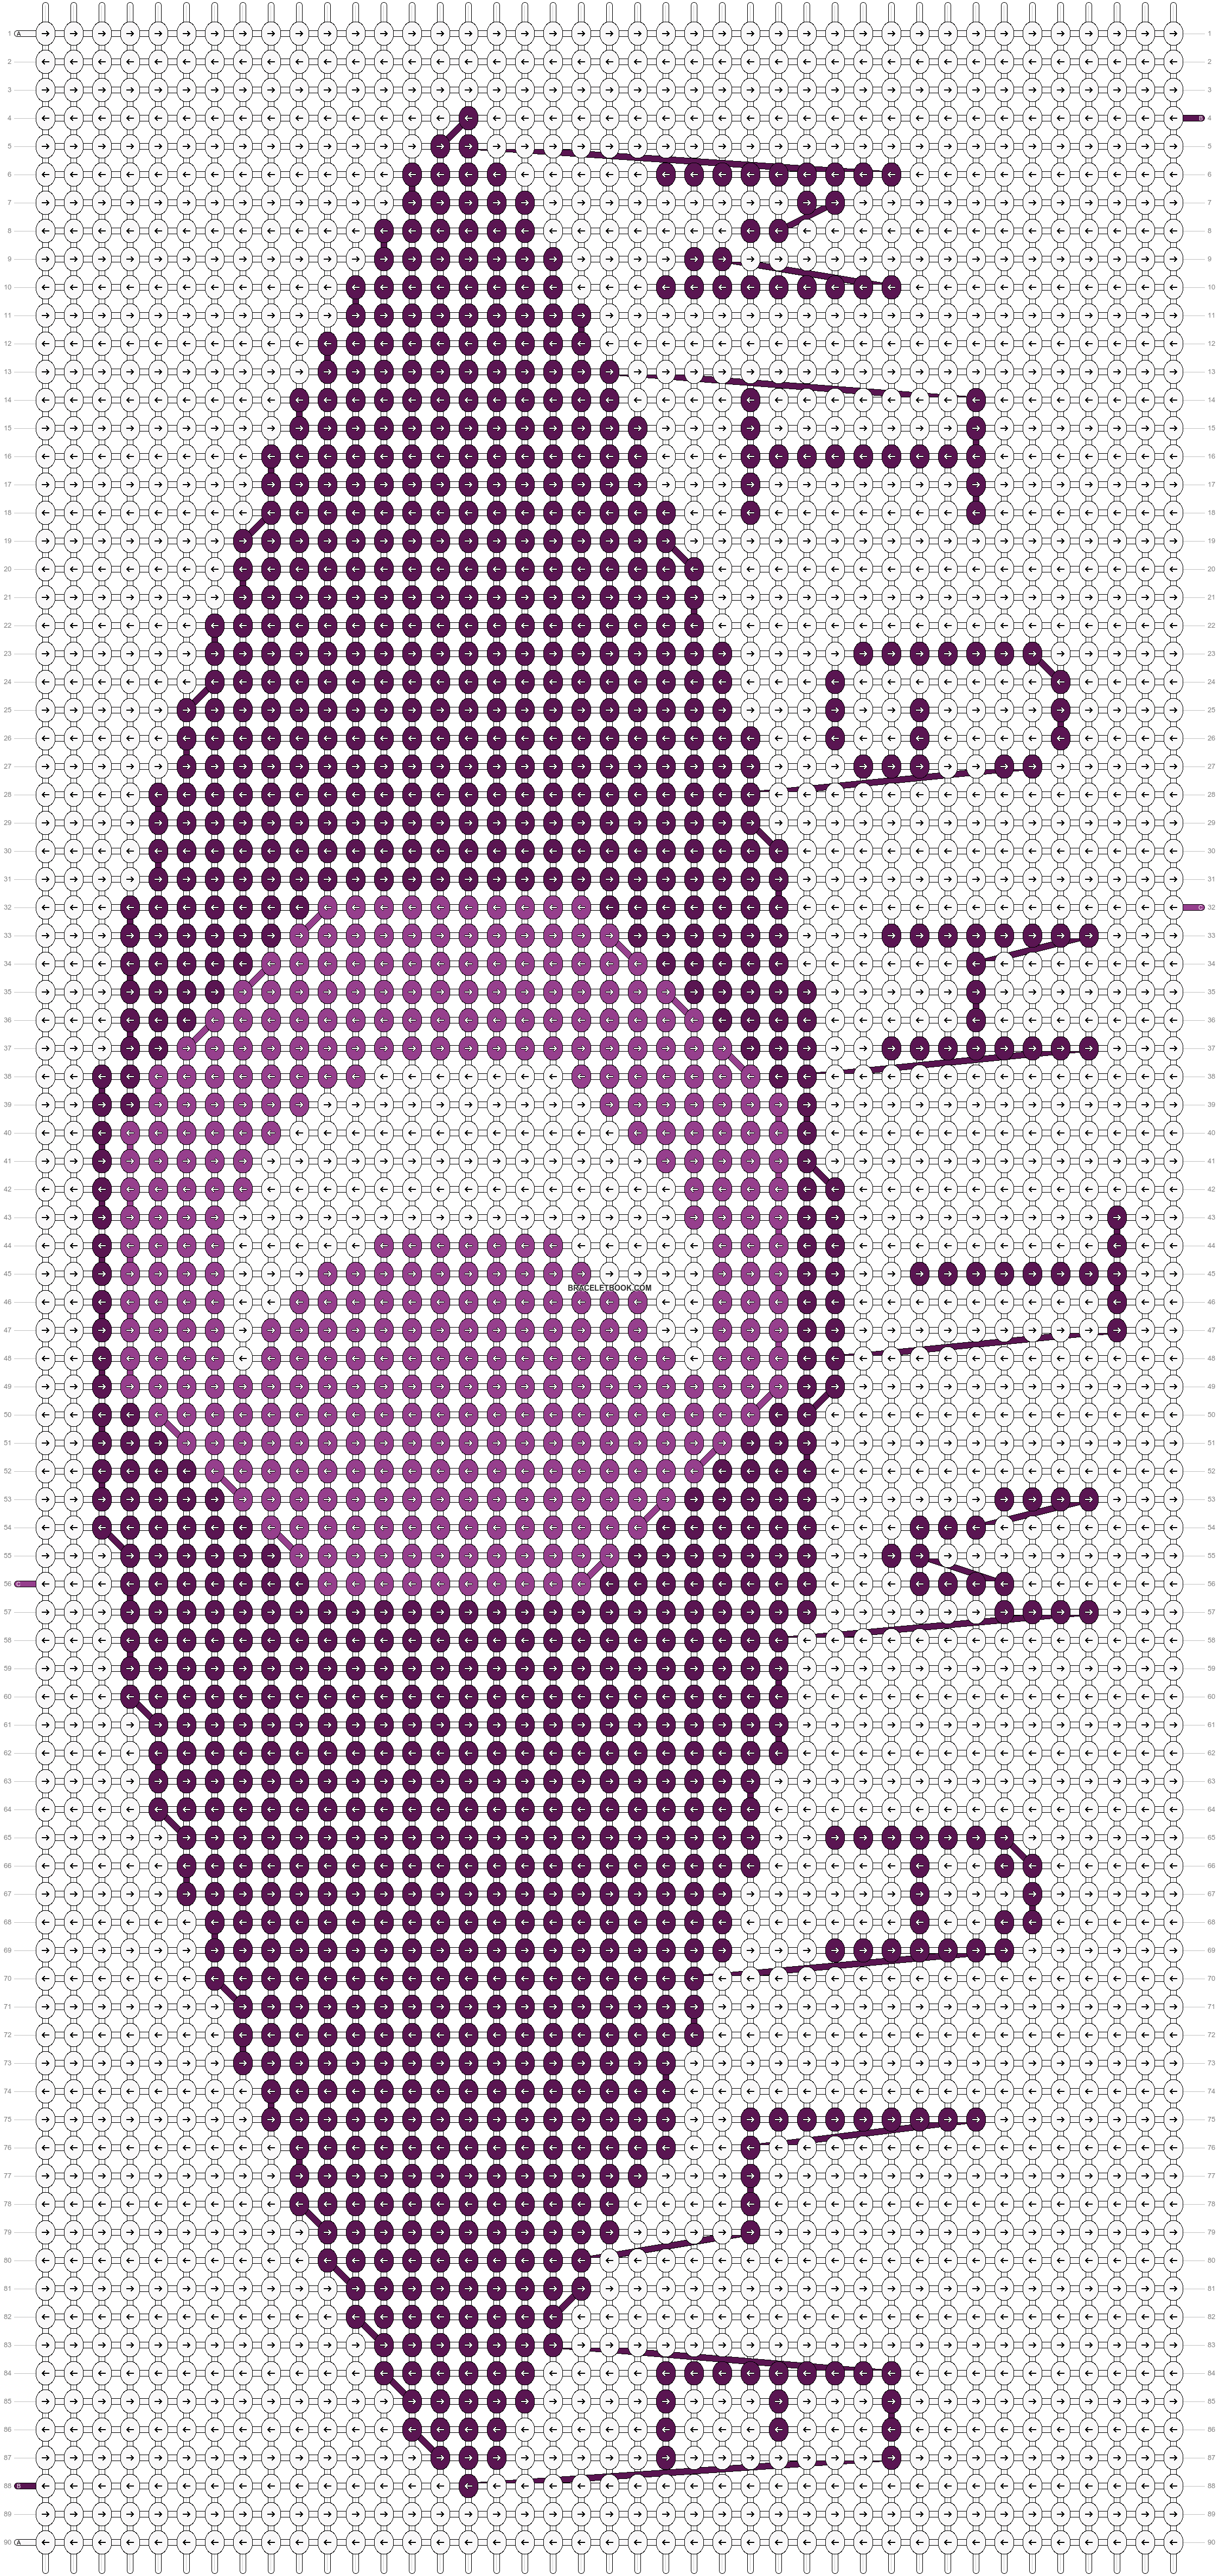 Alpha Pattern #21963 added by JadeHawk52